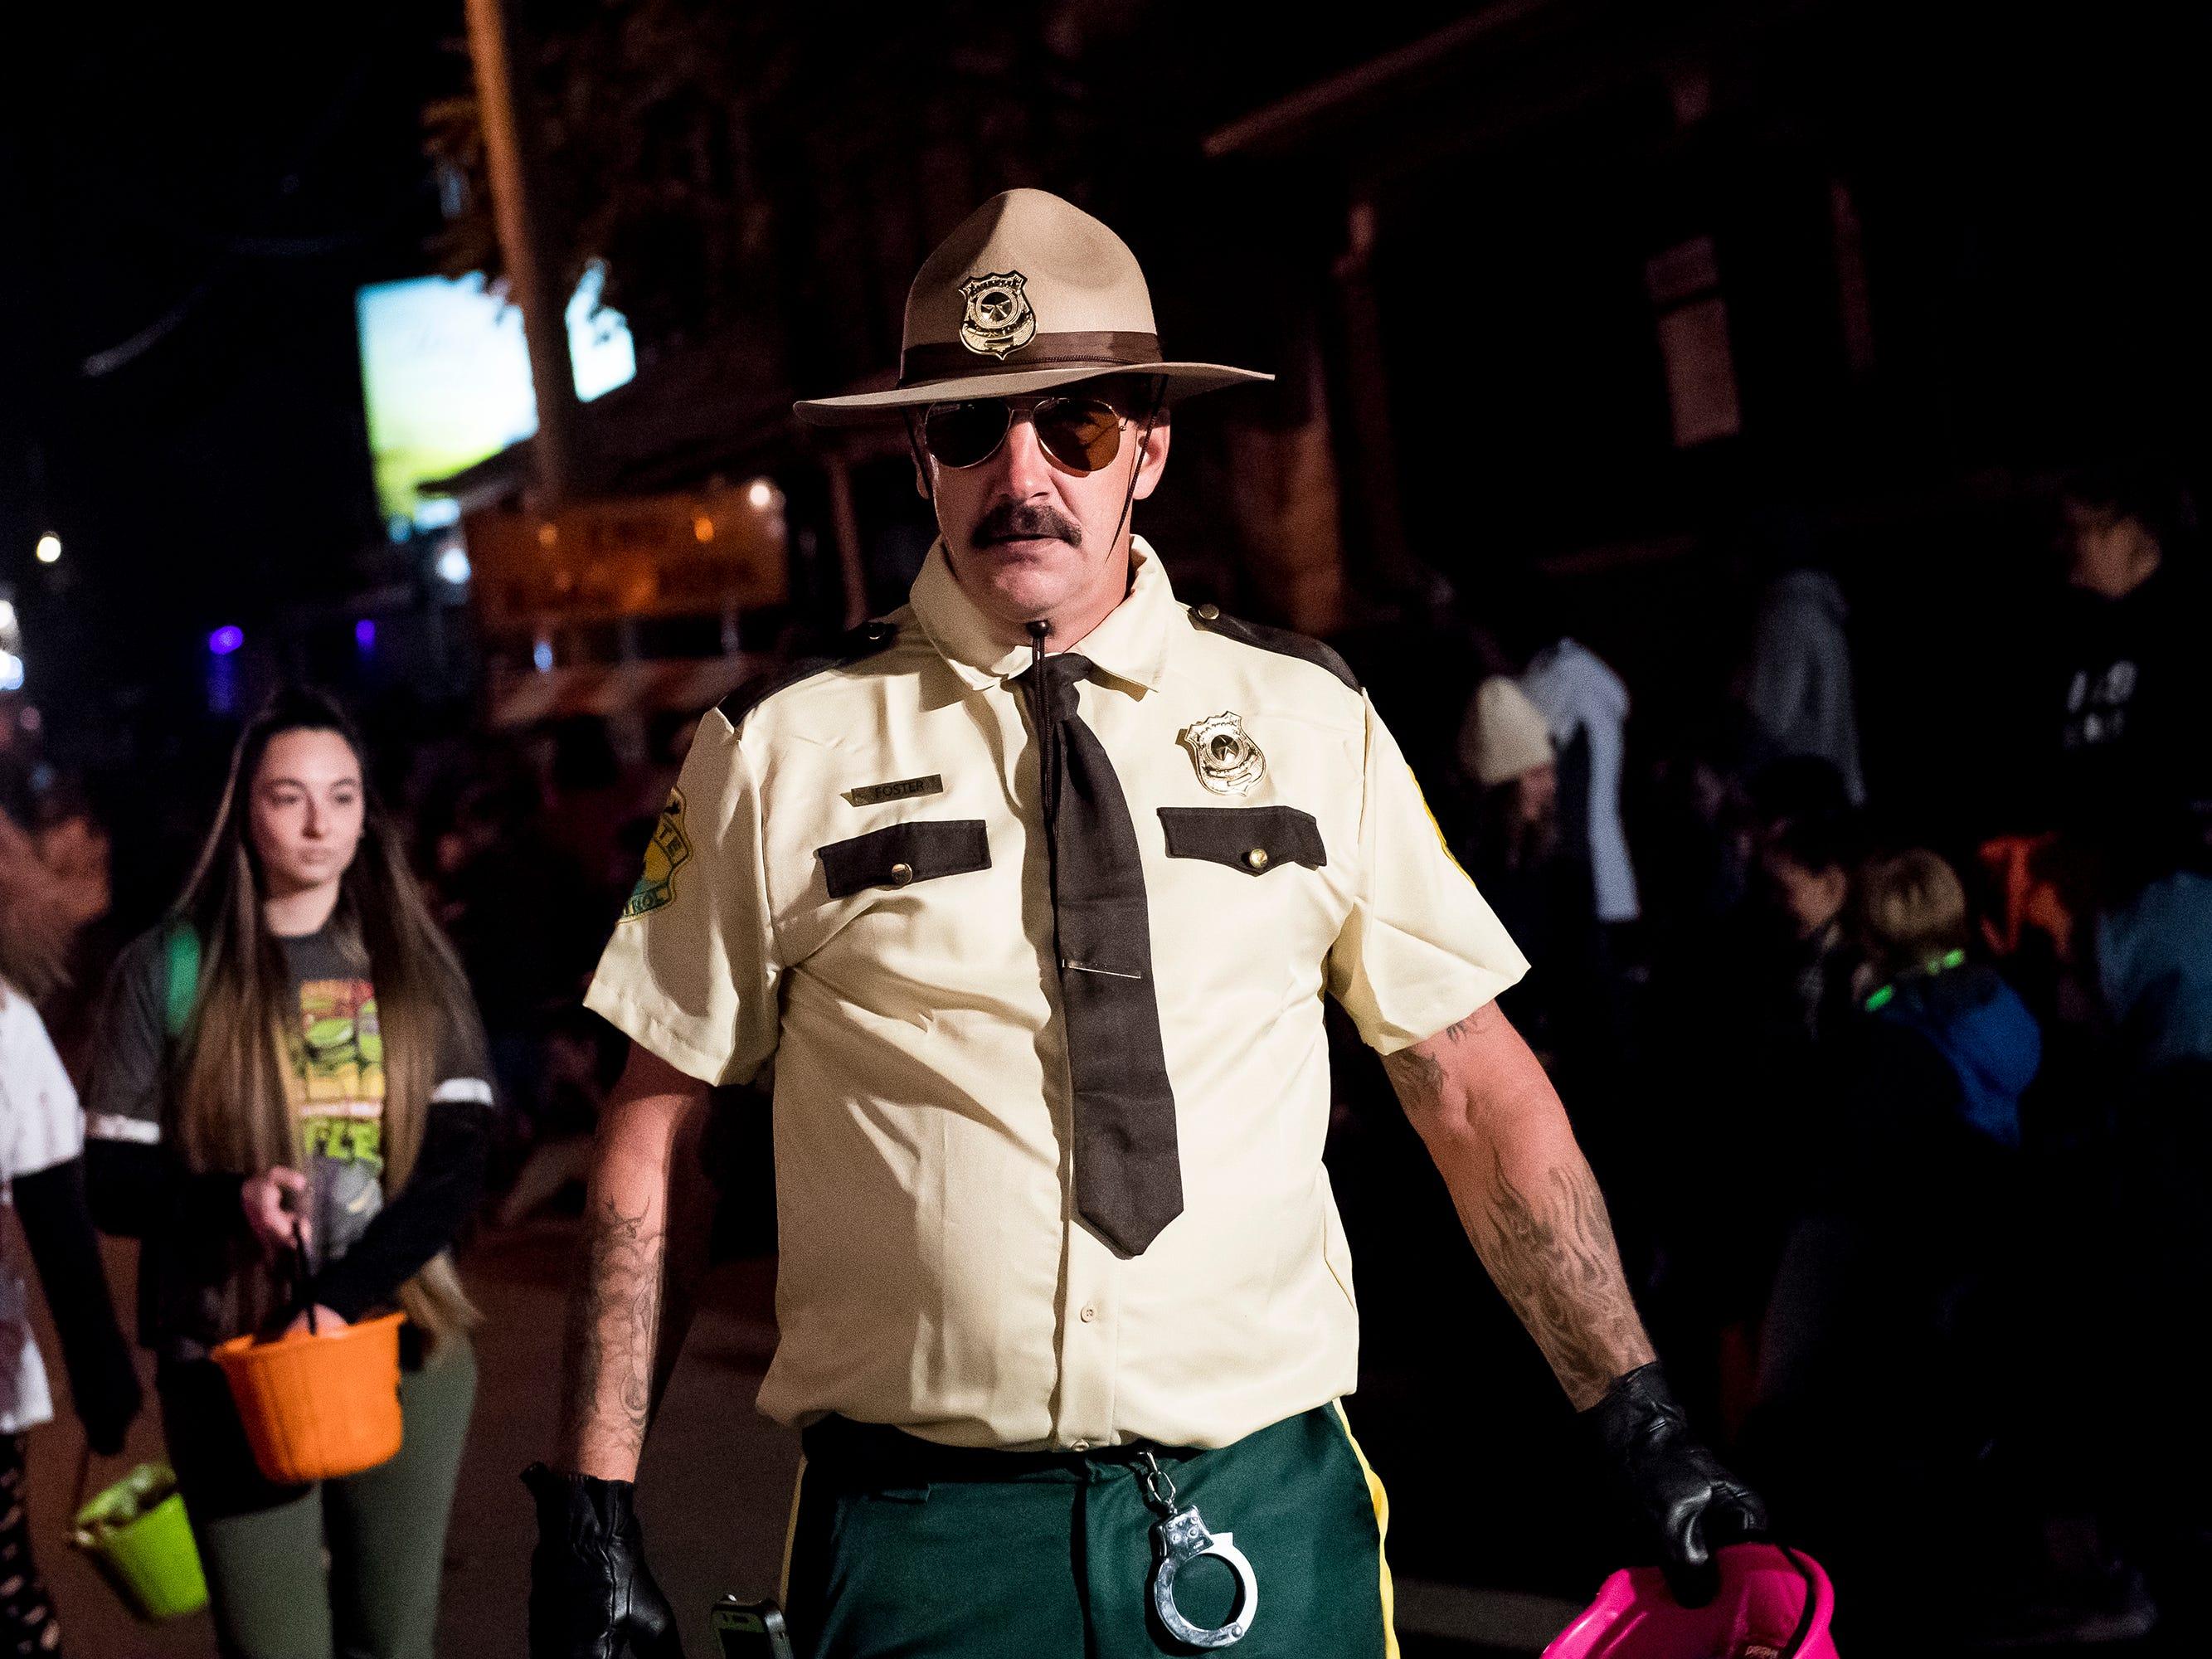 A parade participant makes their way down Baltimore Street during the 77th annual Hanover Halloween parade on Thursday, October 25, 2018.